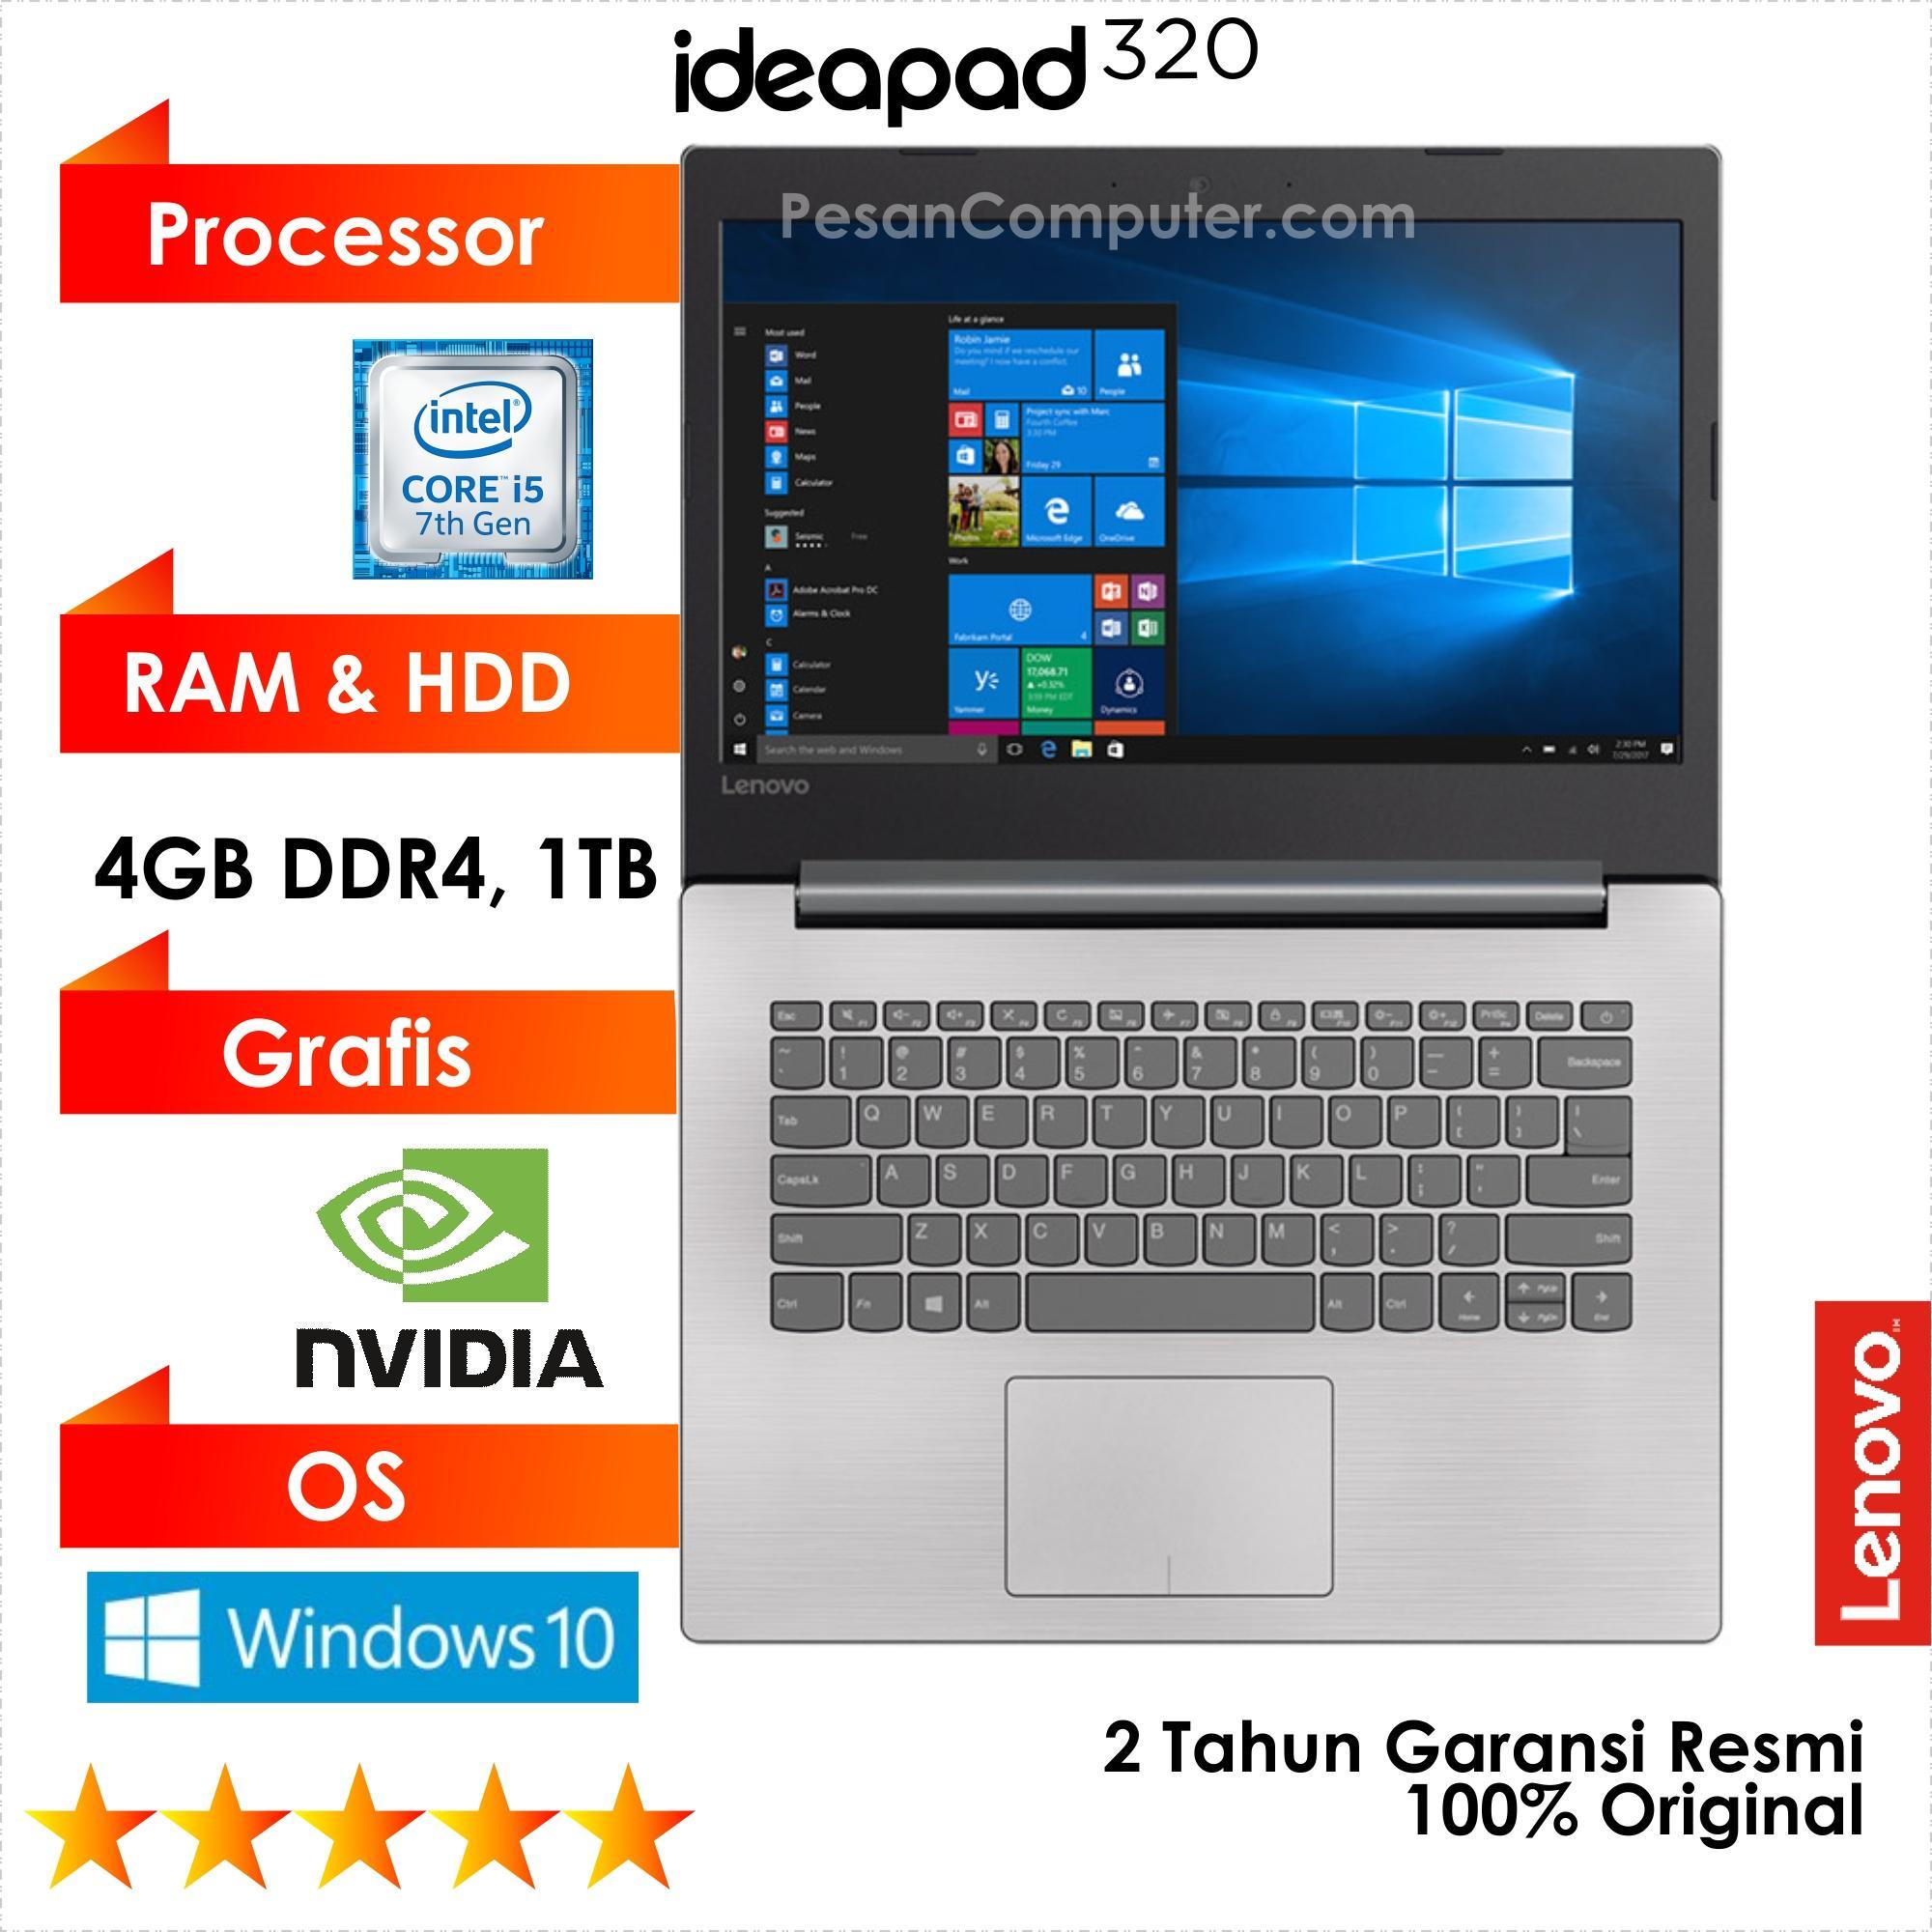 Lenovo IdeaPad 320 - Intel Core i5 7200U / Windows 10 / Intel HD Graphics + NVIDIA GeForce 920MX 2GB / 1TB HDD / RAM 4GB DDR4 / 14 Inch / DVDRW / 2 Tahun Garansi Resmi Lenovo